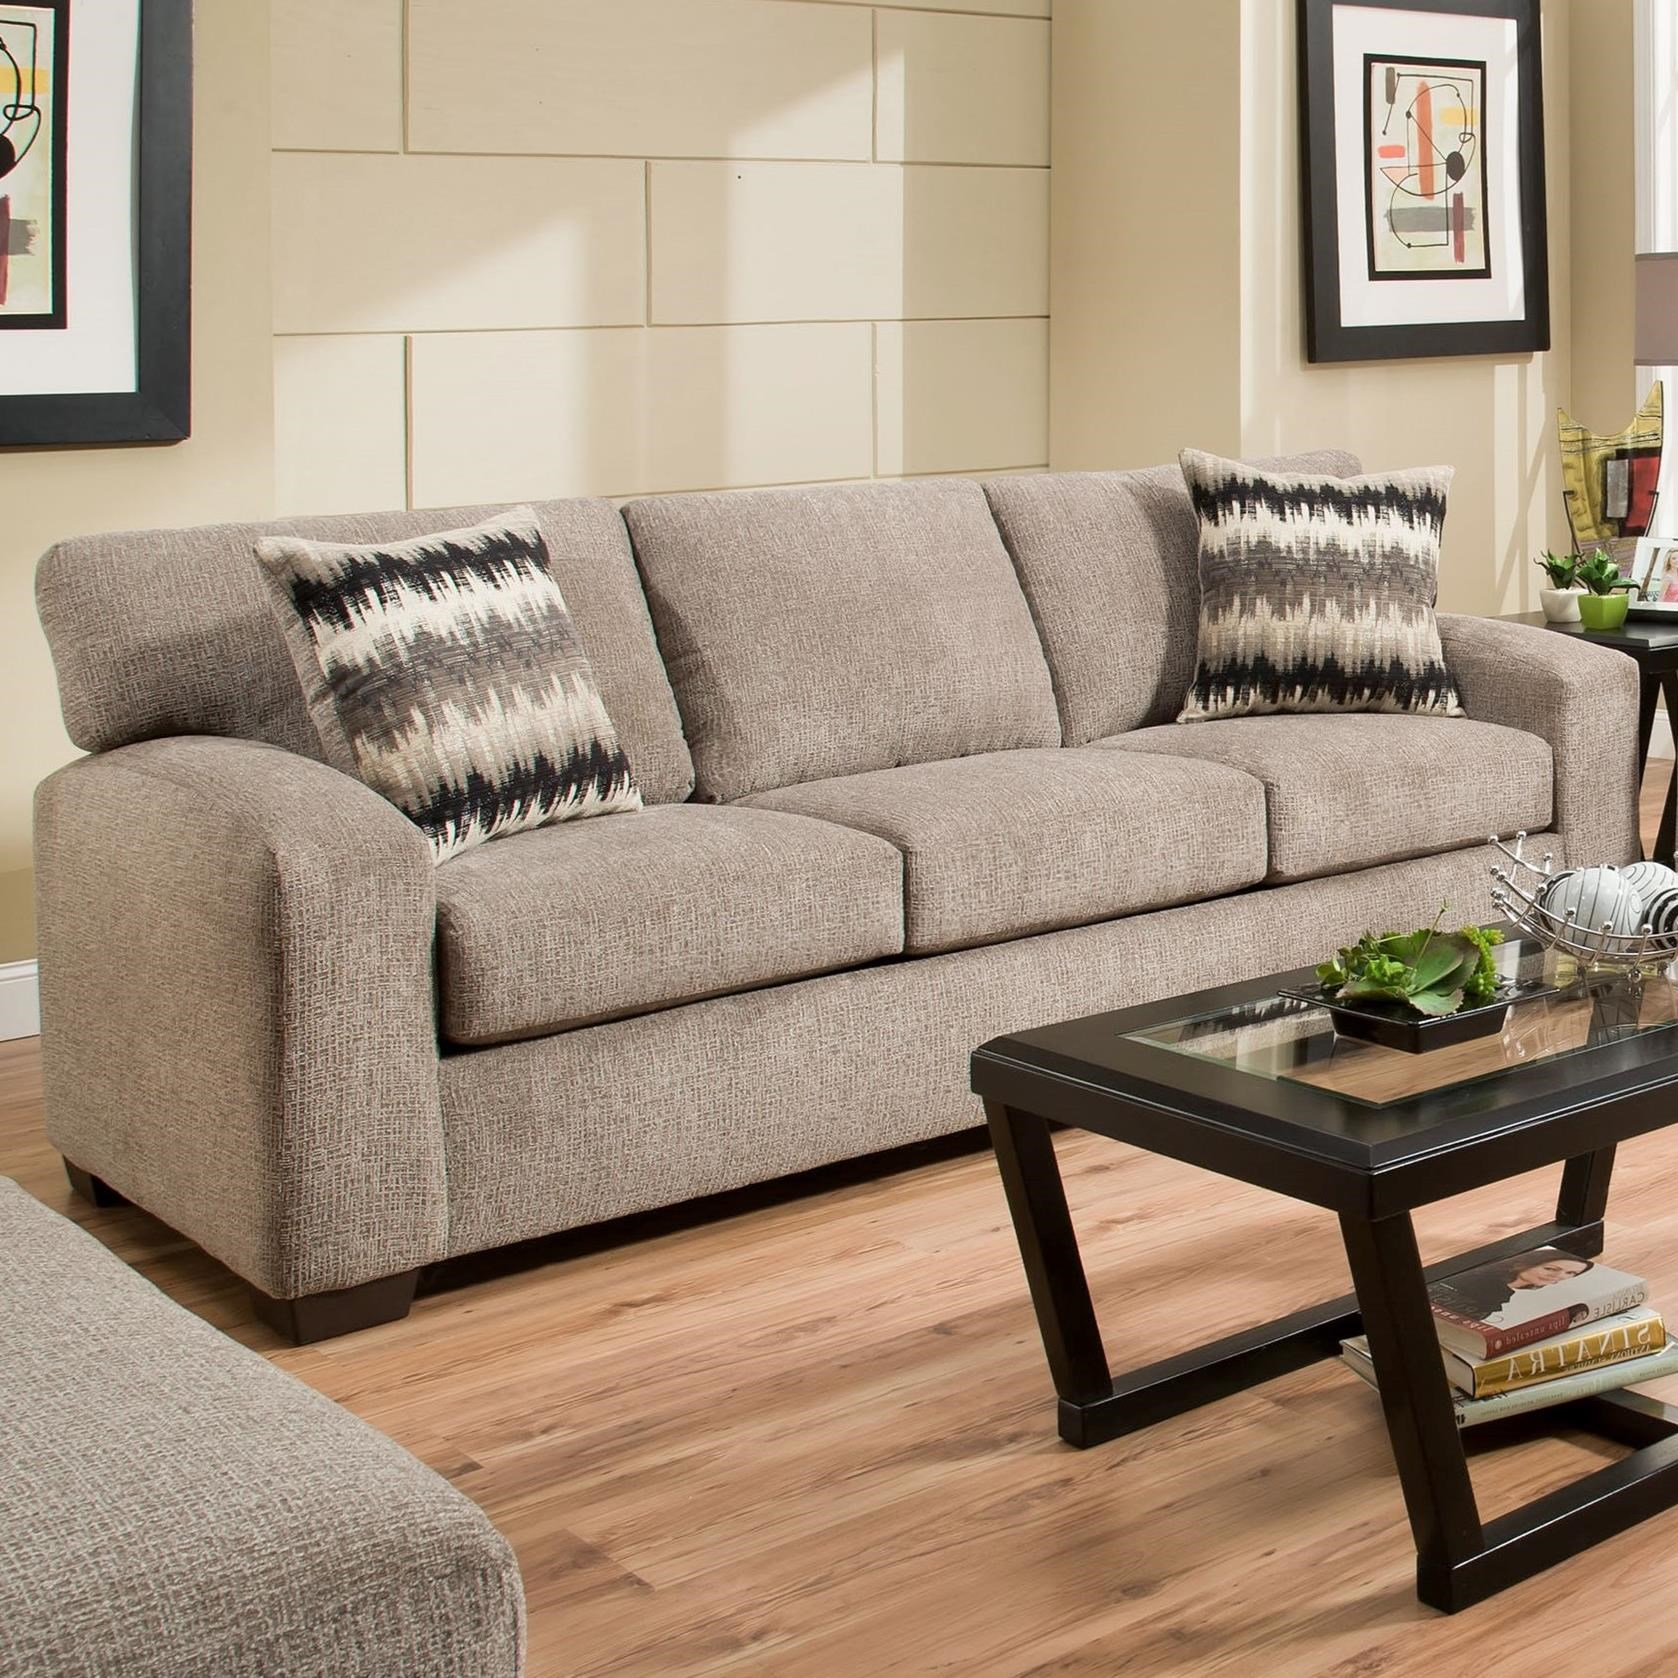 5250 Sleeper Sofa by Peak Living at Prime Brothers Furniture